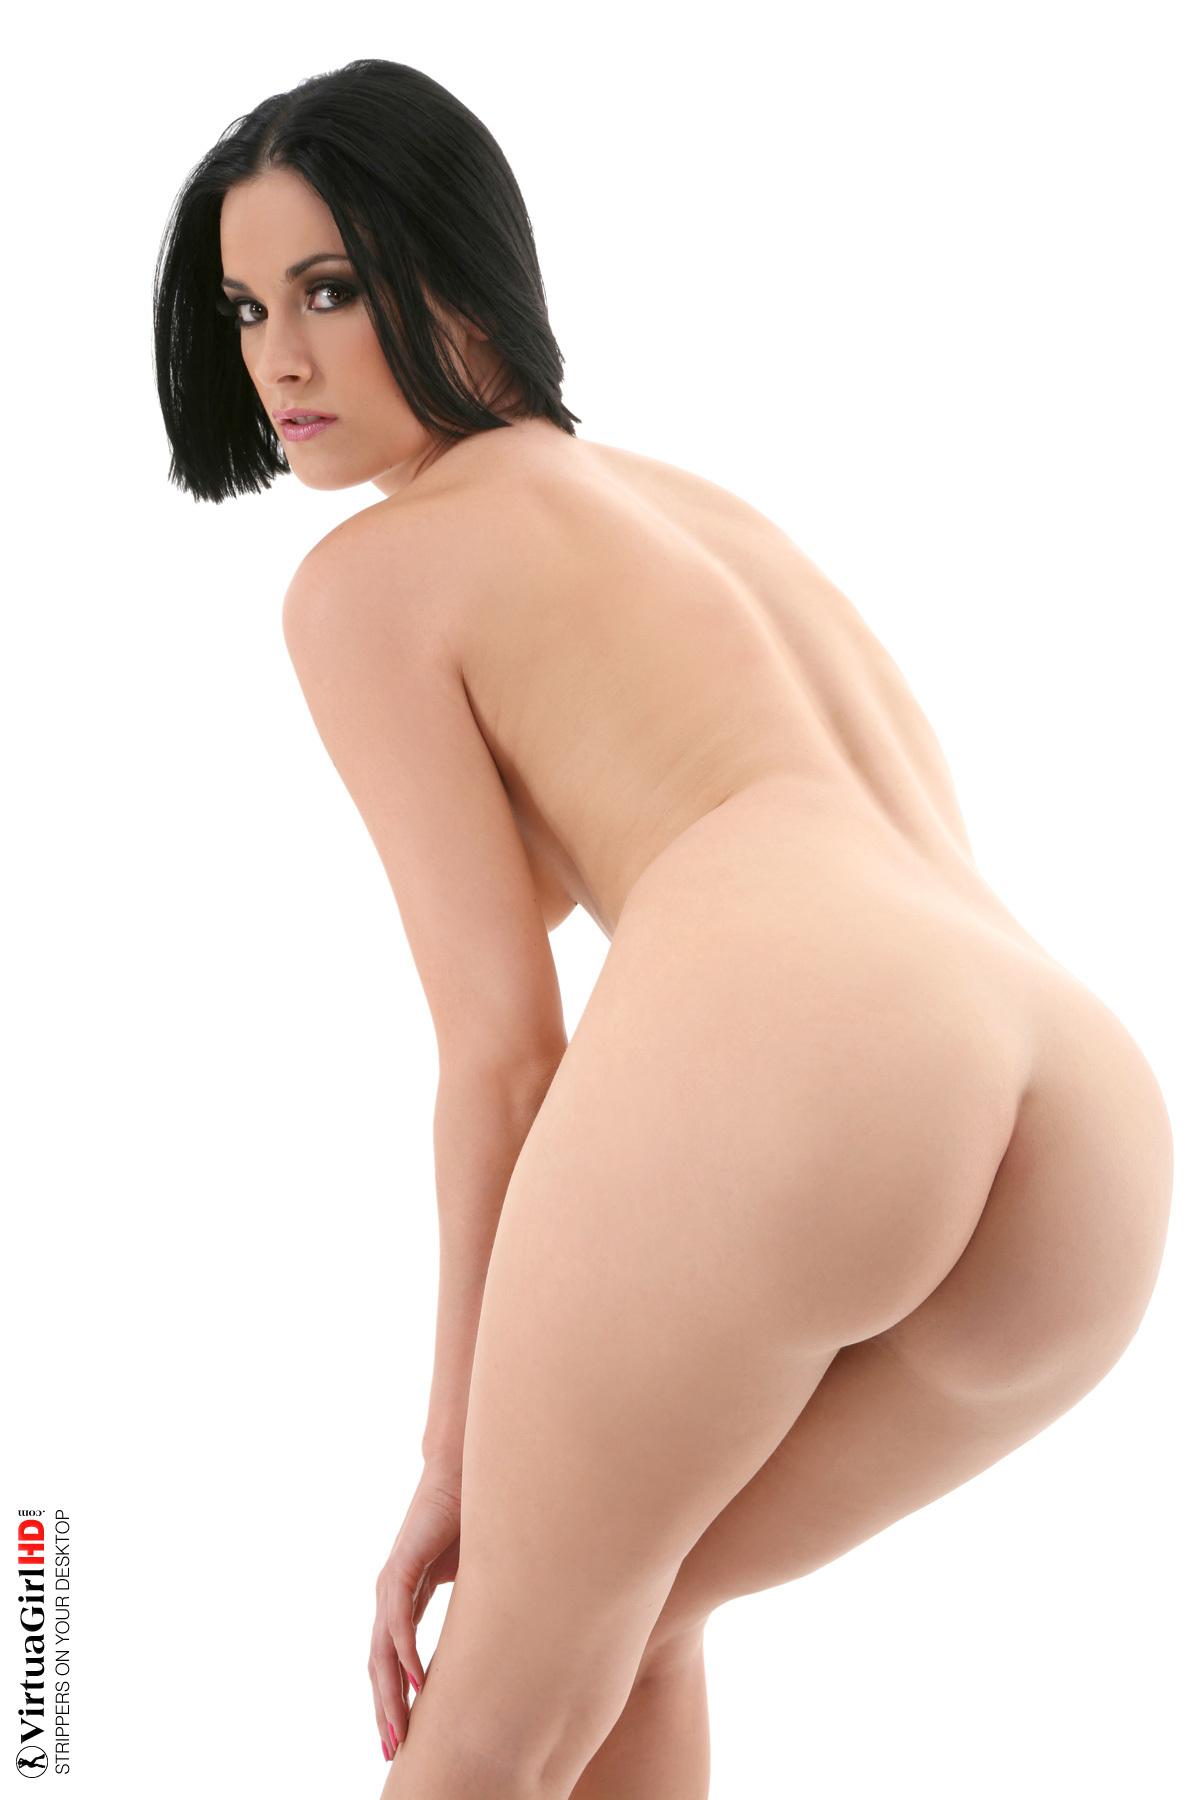 teen girls stripping on cam pornhub